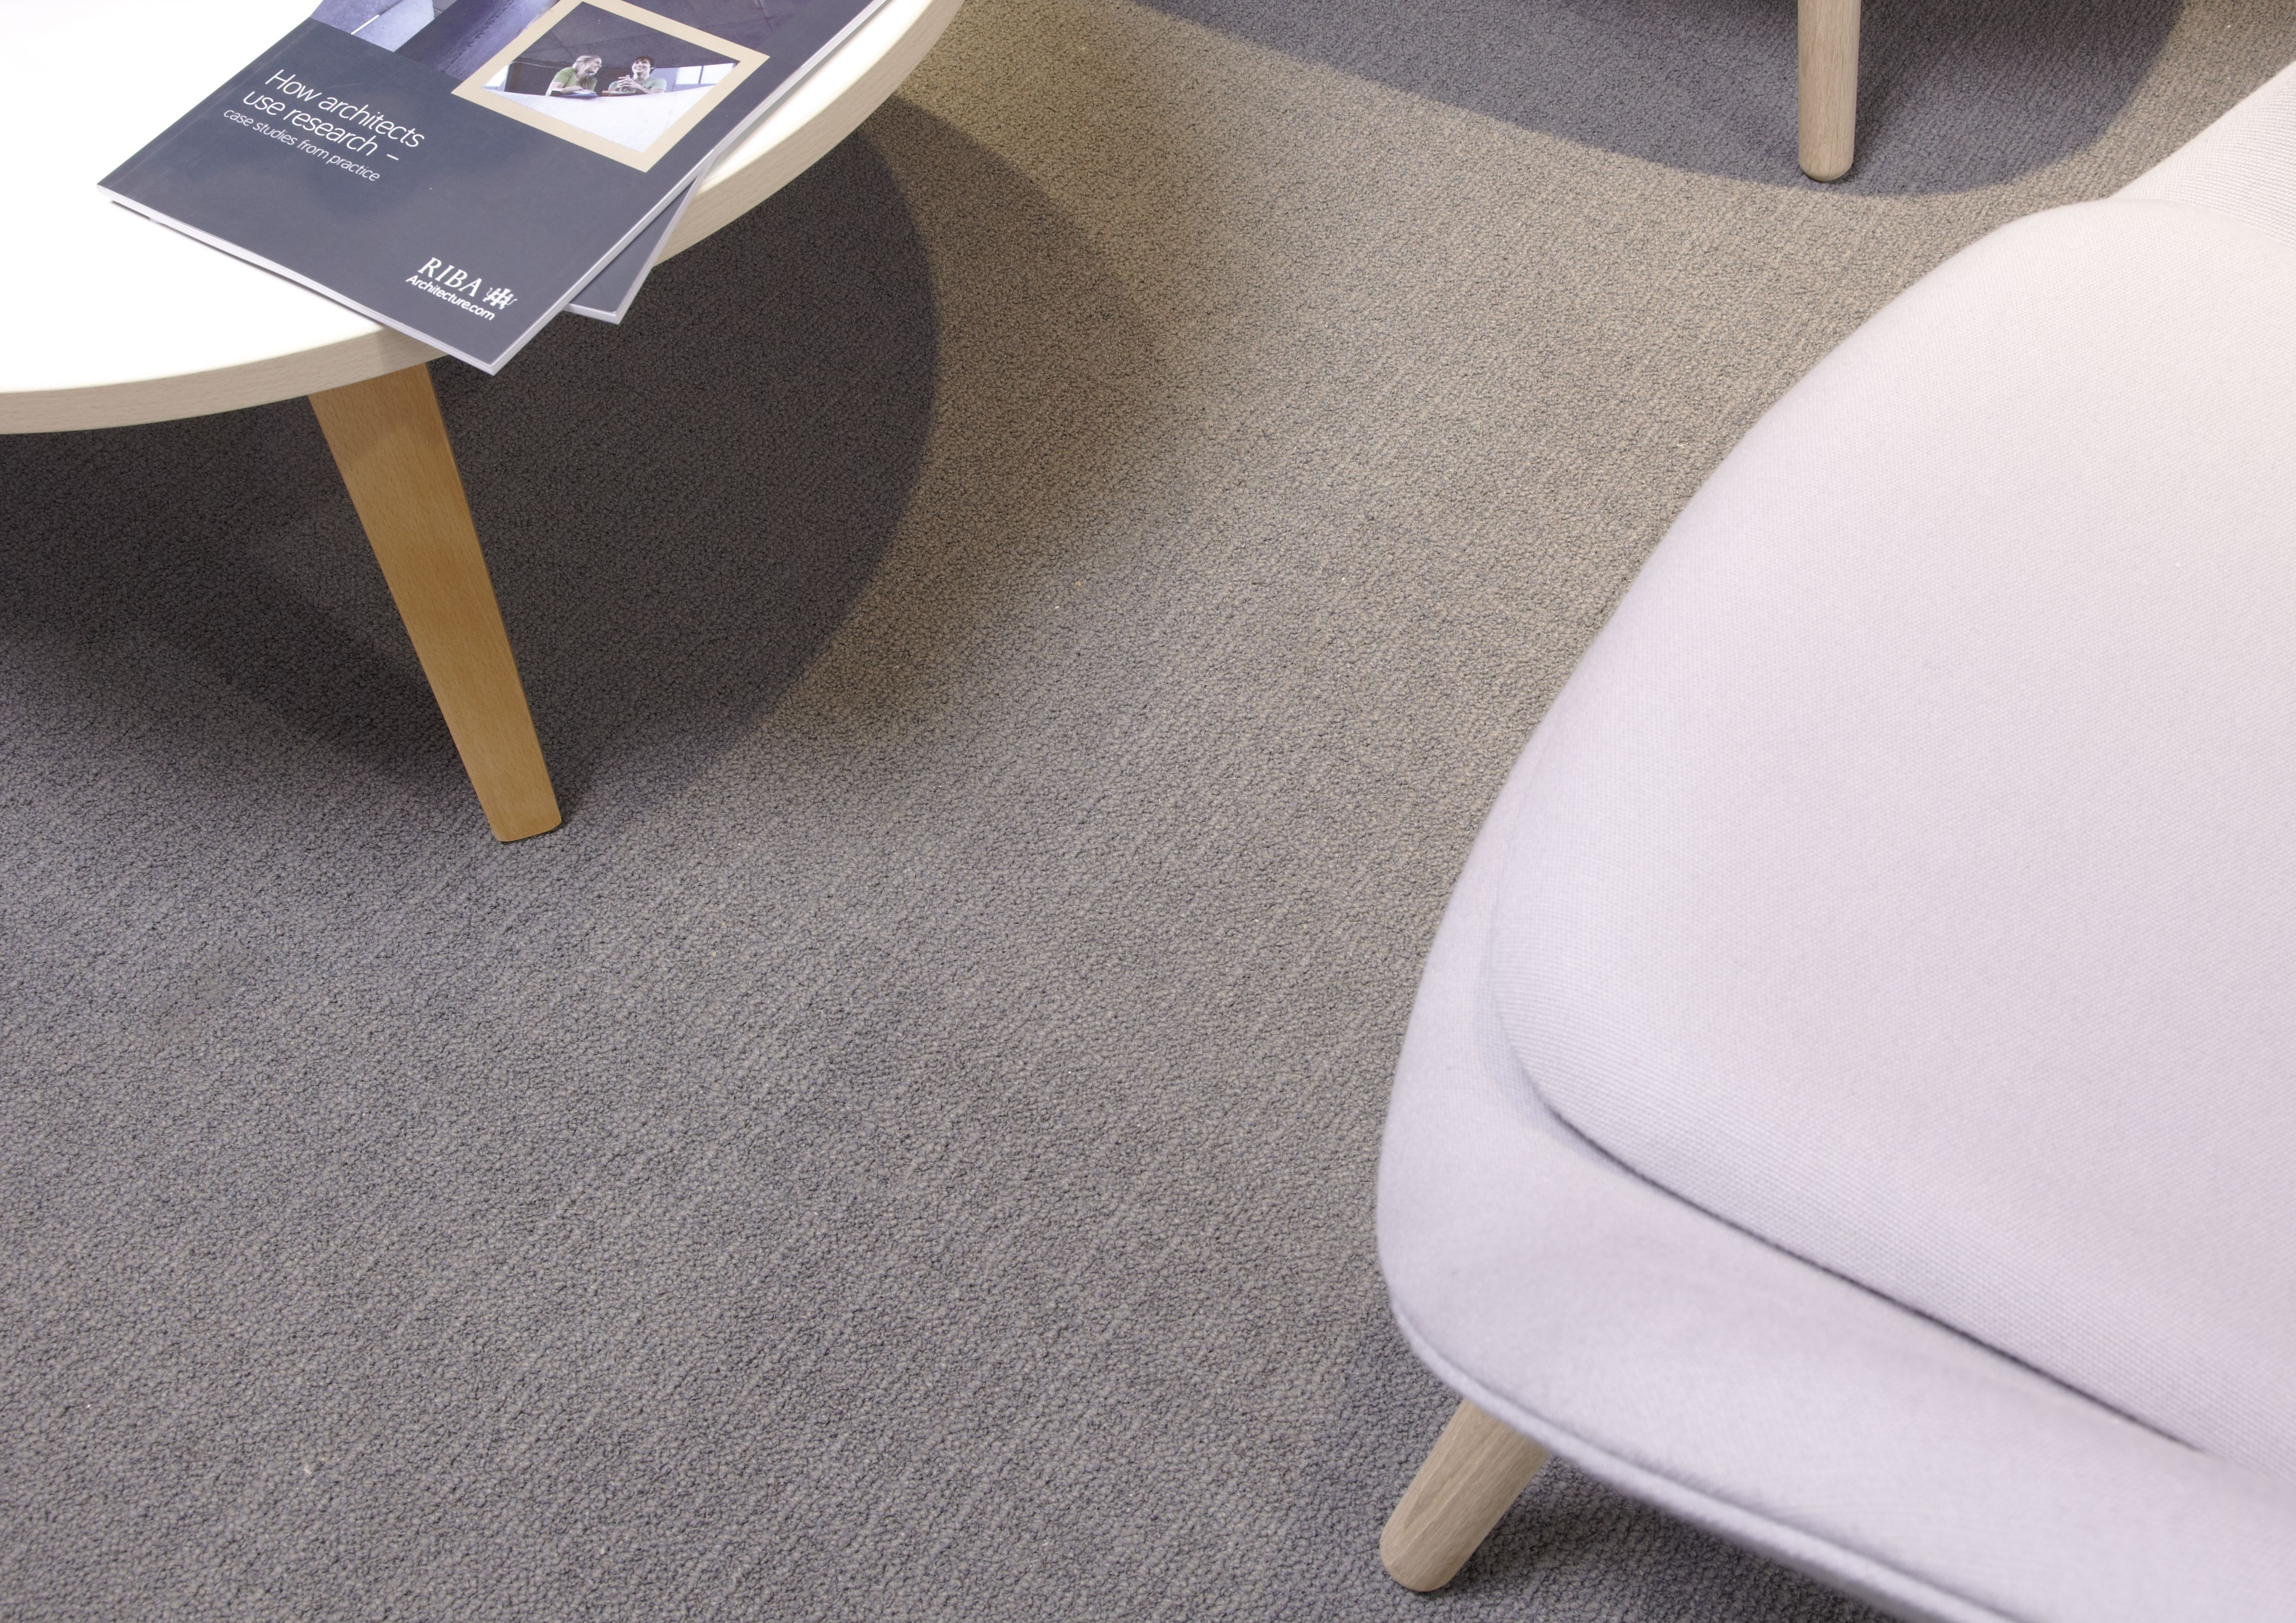 Schön DESSO AirMaster@ Installed In The Prestigious RIBA HQ Building #Carpet  #Interiors #InteriorDesign #RIBA #OfficeSpace #Office #Design #AirMaster  #Deu2026